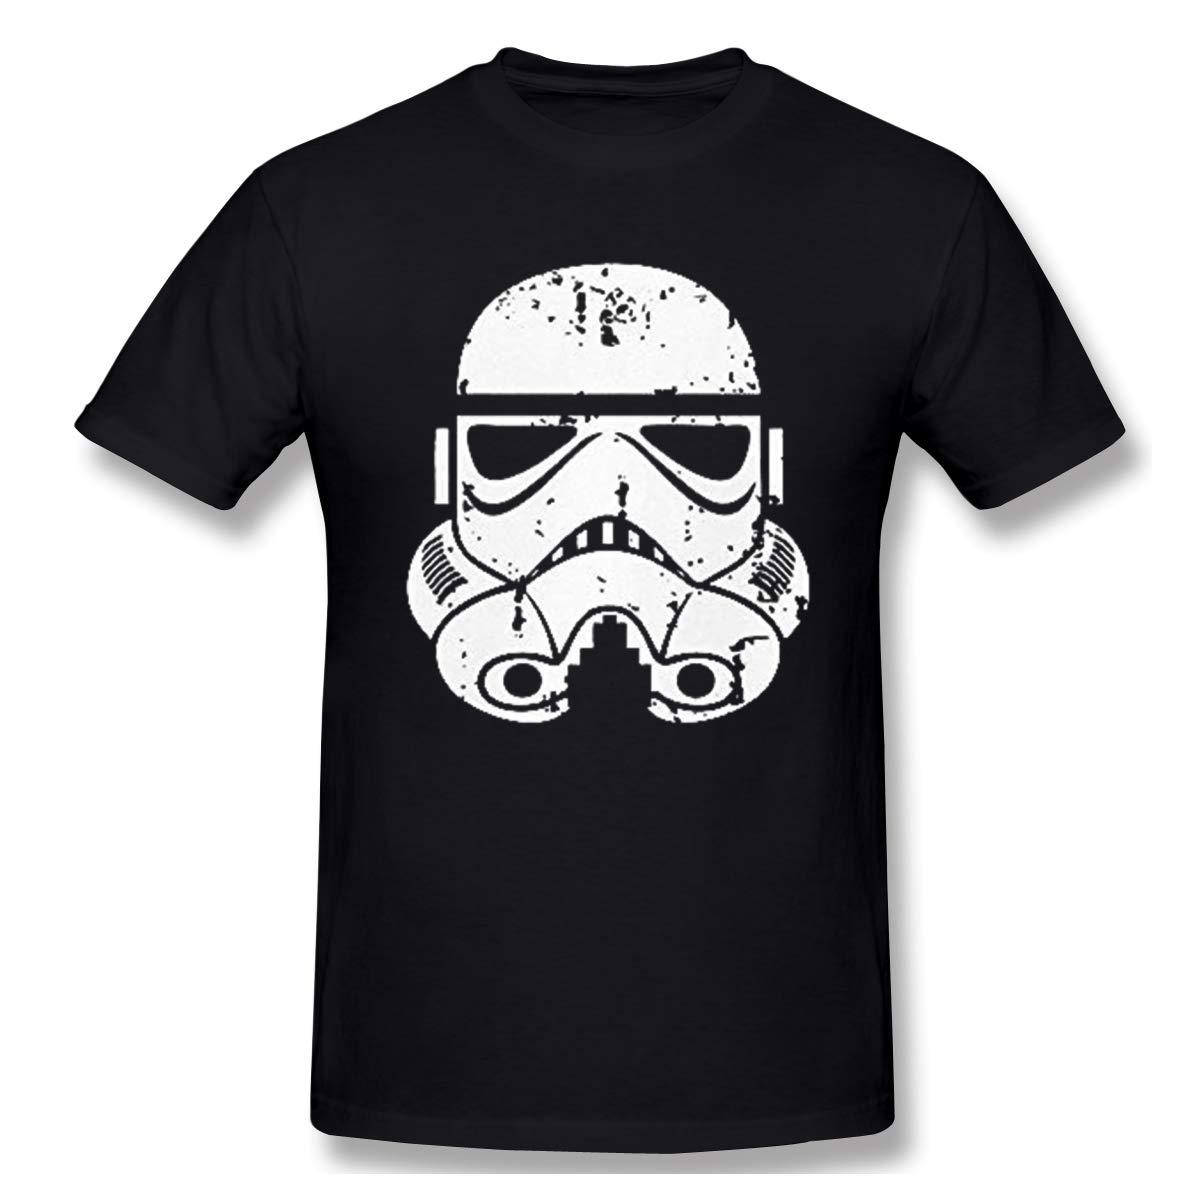 Perfectmeet Distressed Stormtrooper Storm Trooper Short Sleeve T Shirt 2336